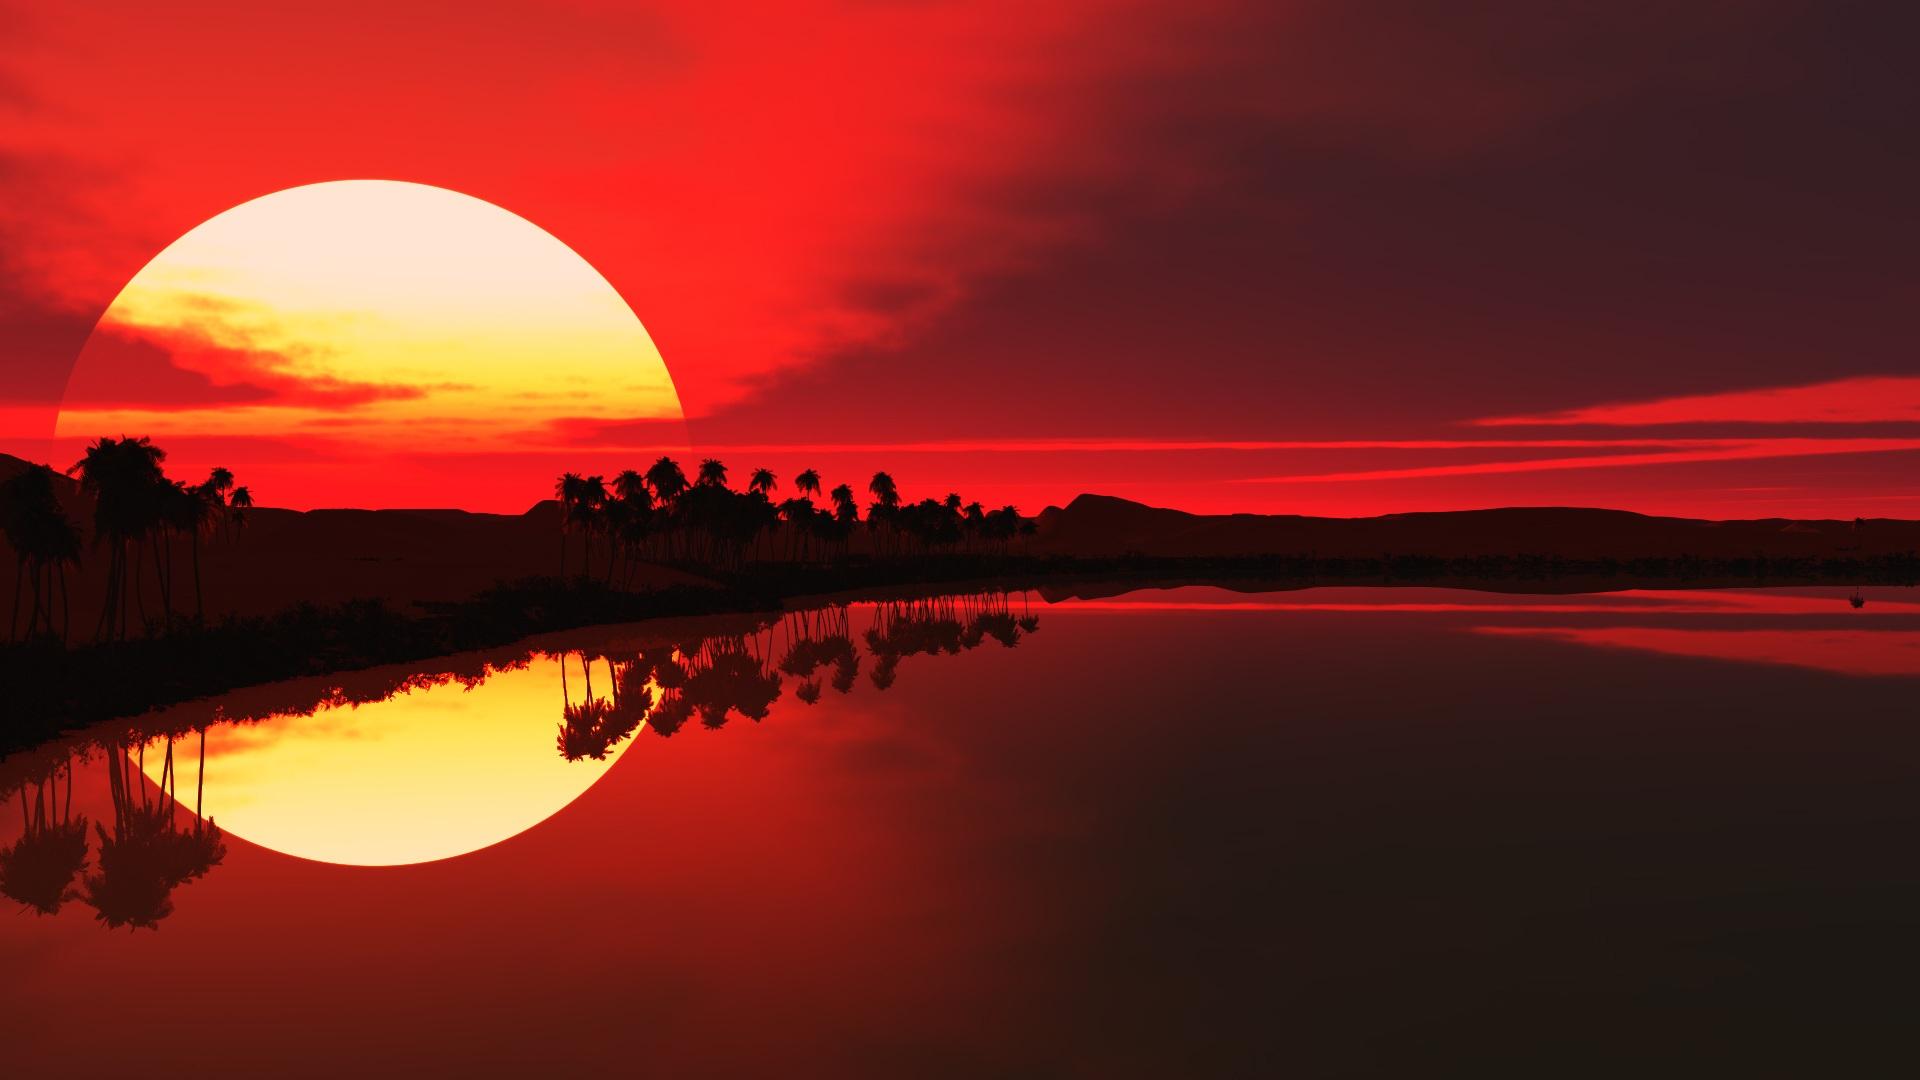 Best 3d Hd Wallpapers For Laptop Sunset Wallpapers Hd Pixelstalk Net